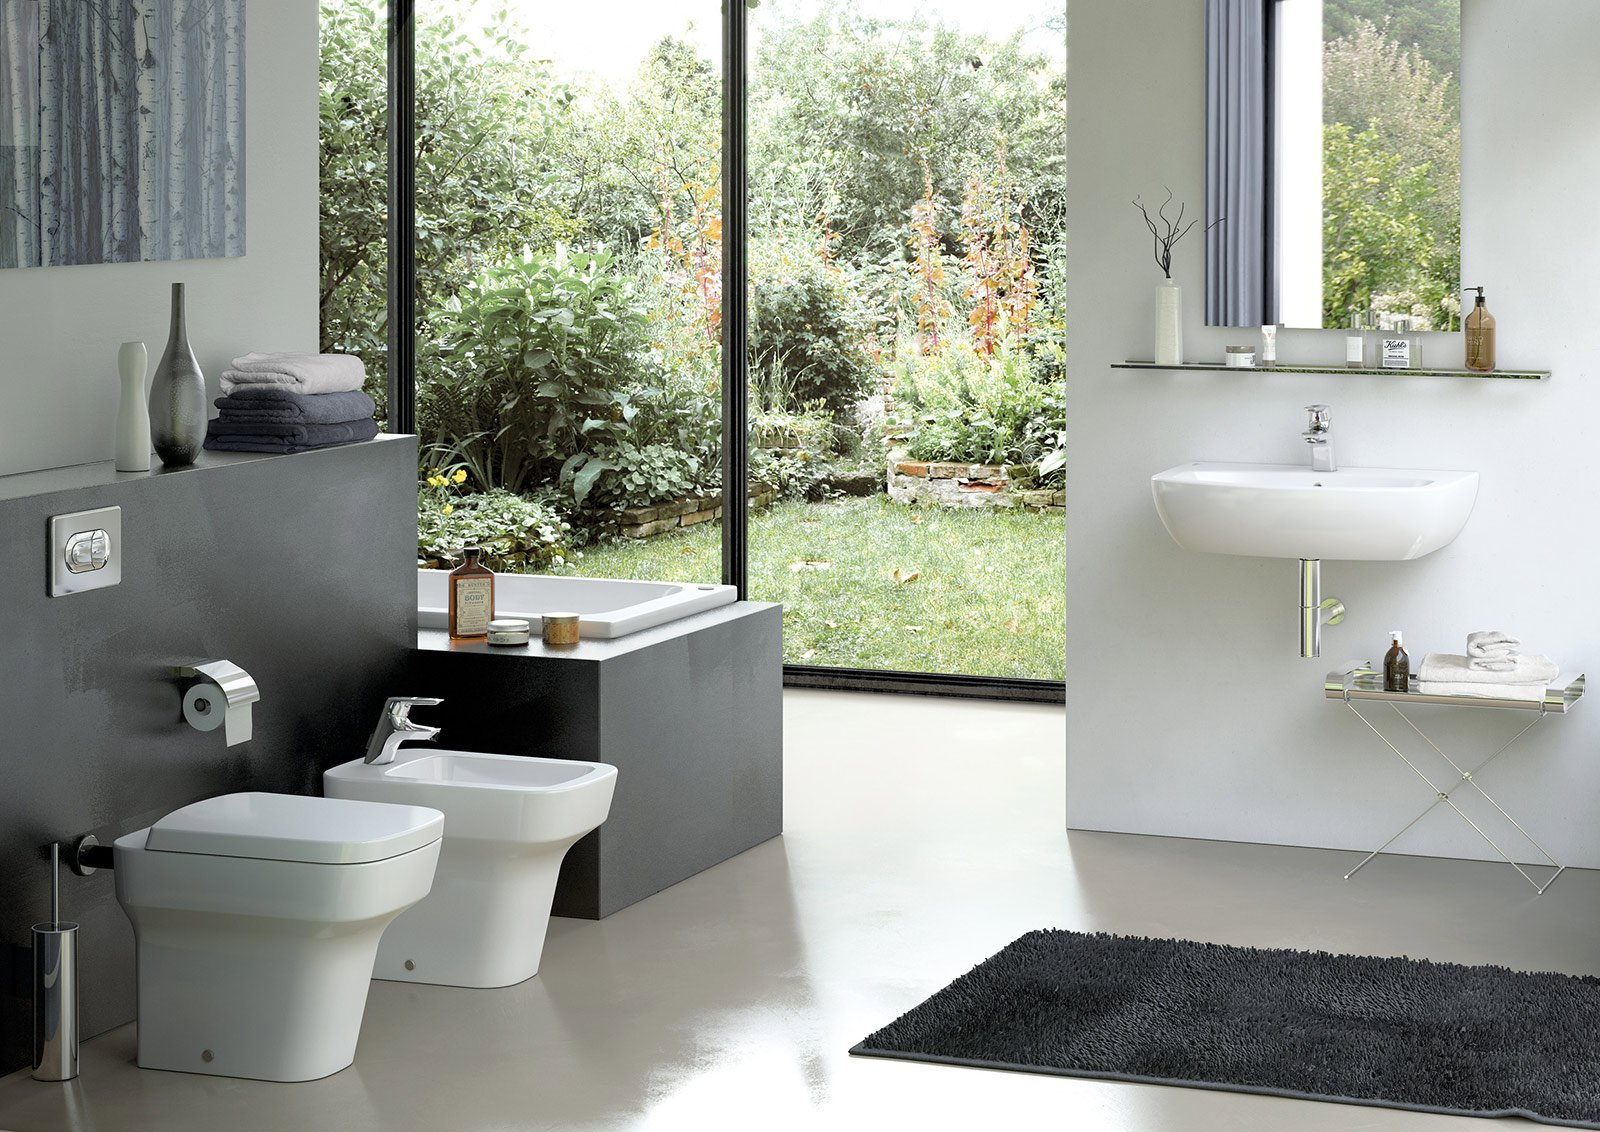 sanitari vaso e bidet low cost cose di casa. Black Bedroom Furniture Sets. Home Design Ideas